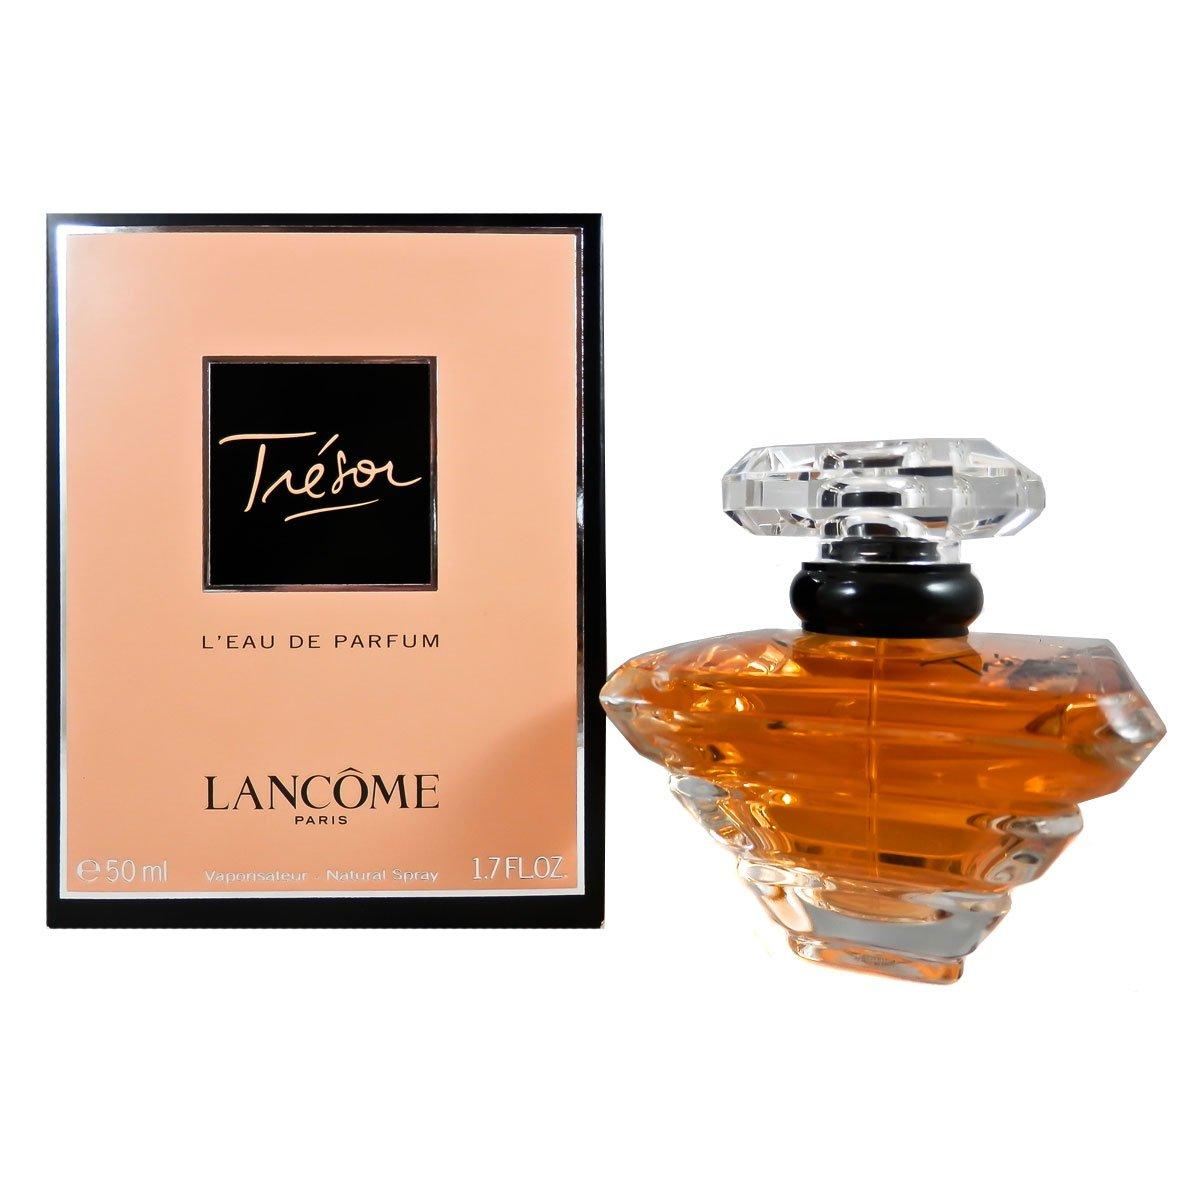 LANCOME TRESOR agua de perfume vaporizador 50 ml 125237_OB LAN803491_-50ml